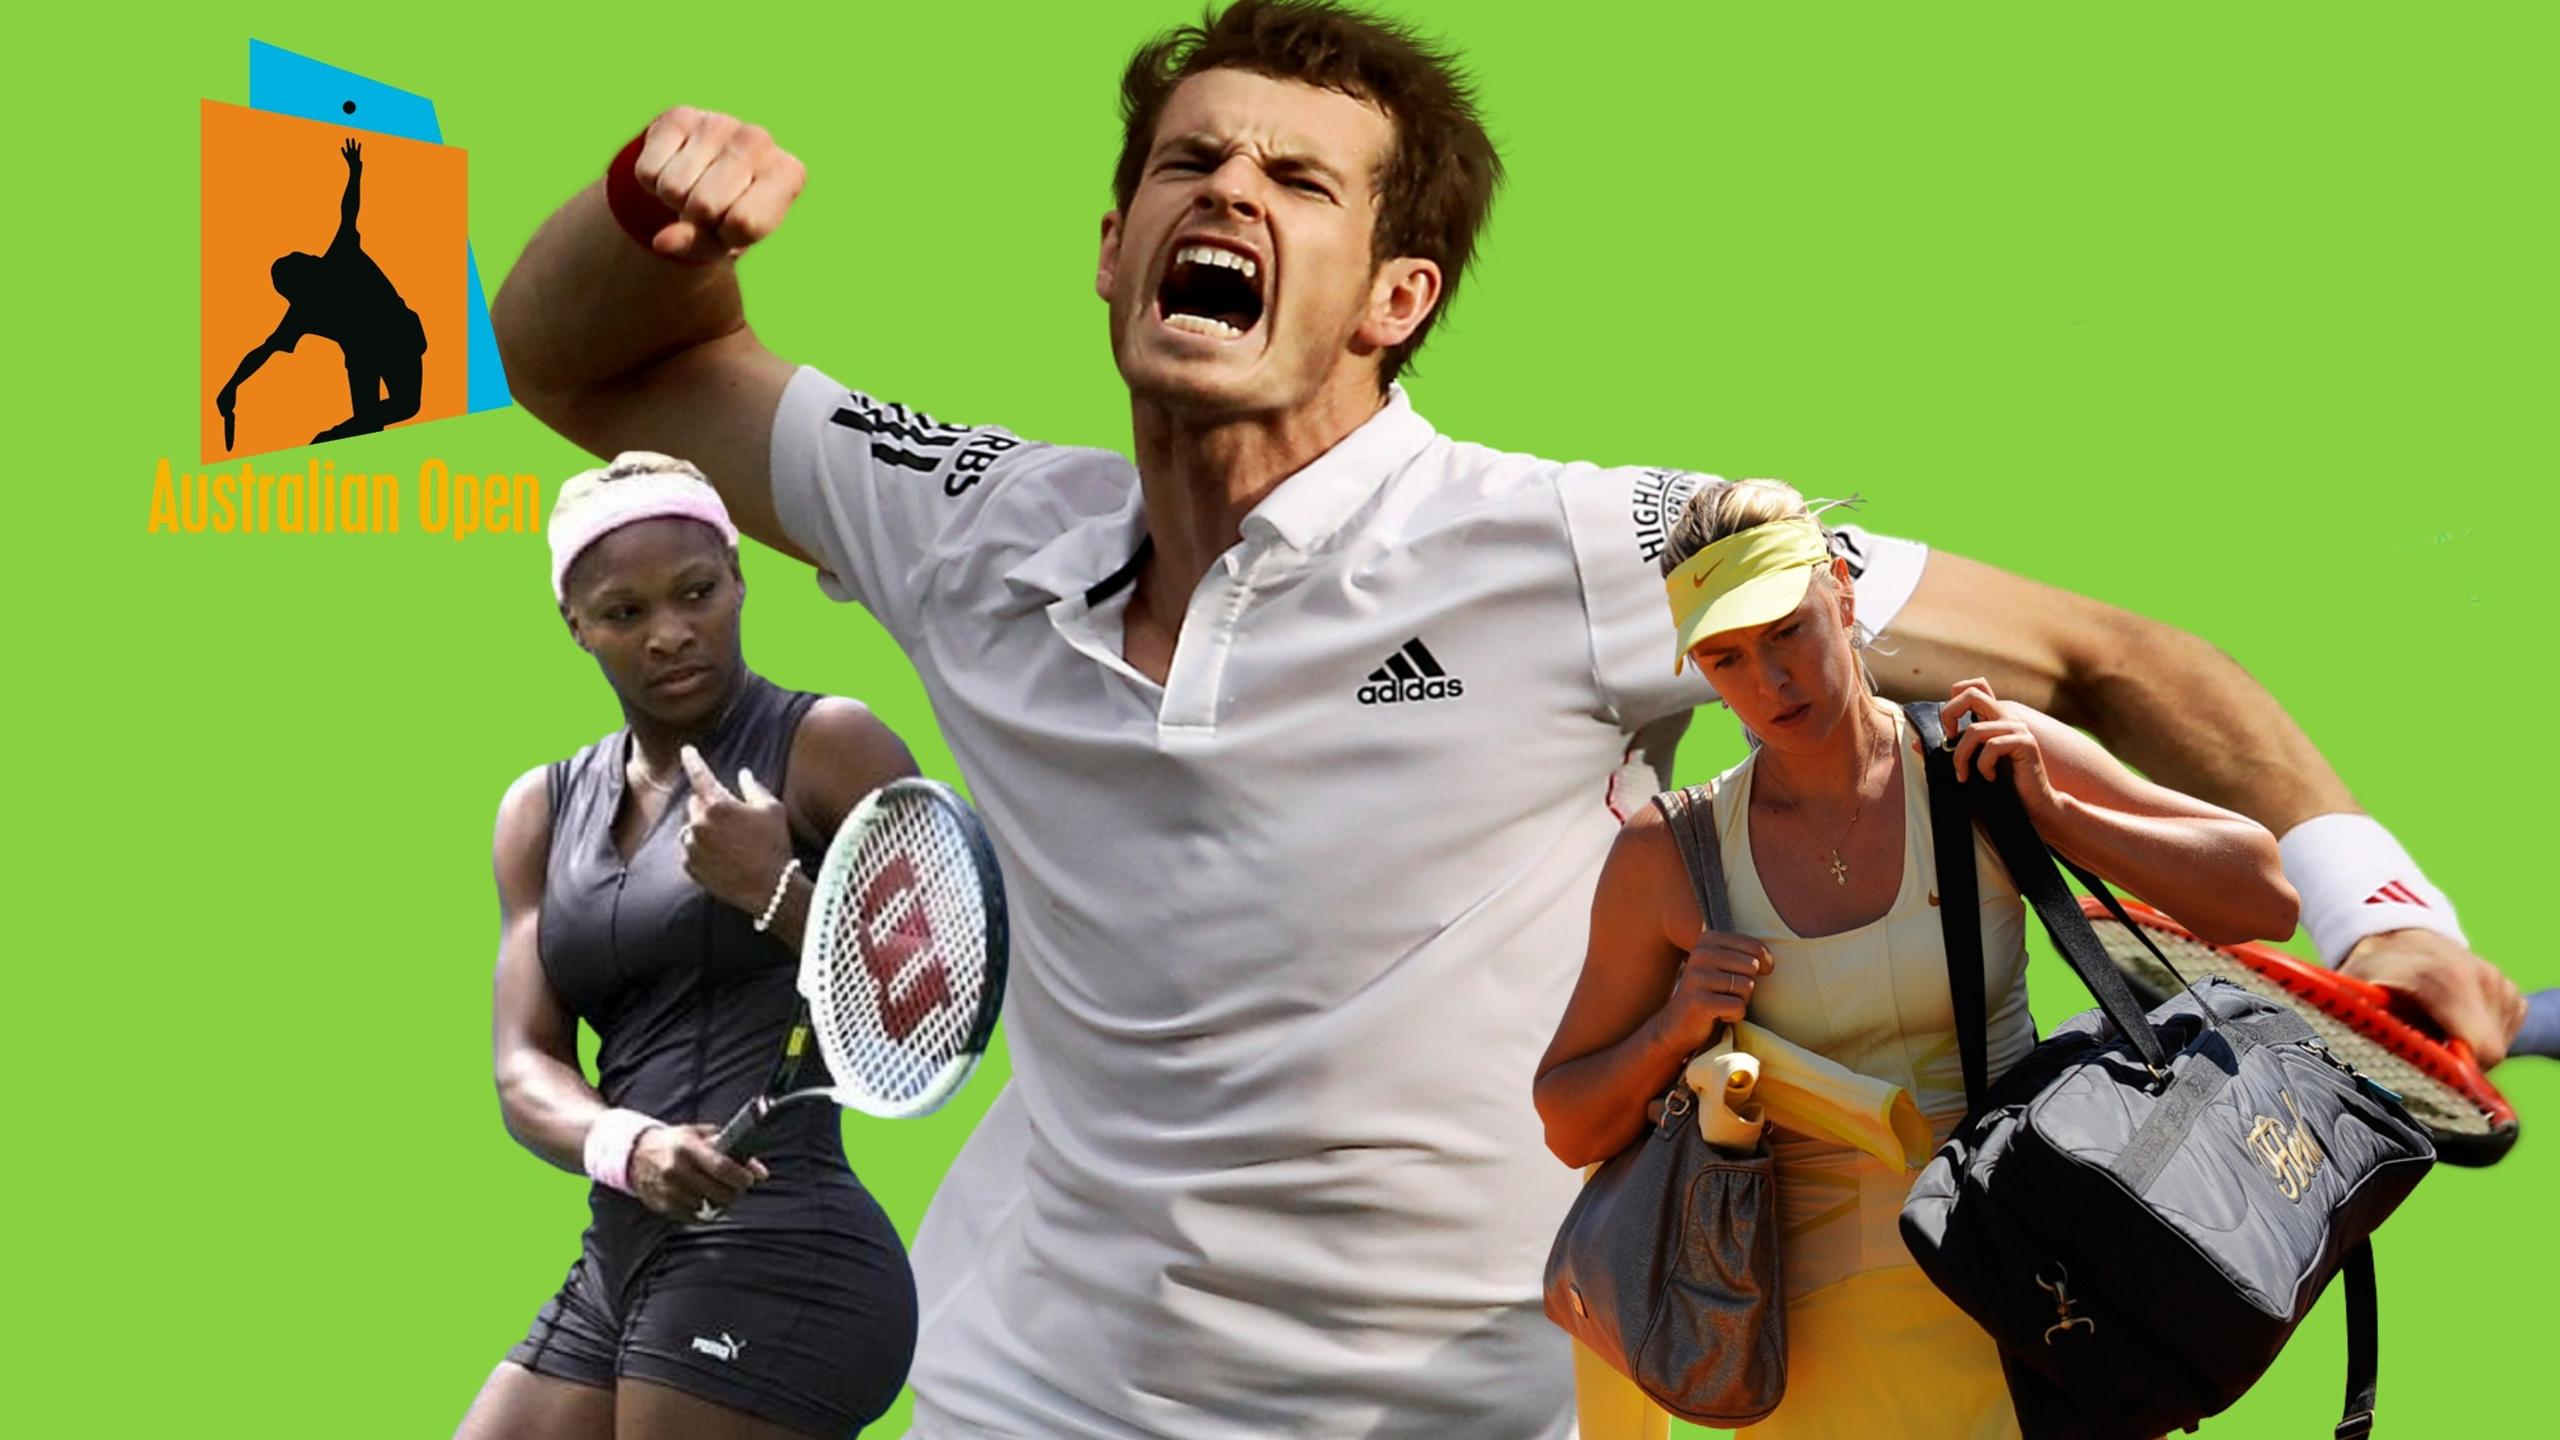 Серена Уильямс, Мария Шарапова и Энди Маррей – в финале Australian Open 2015